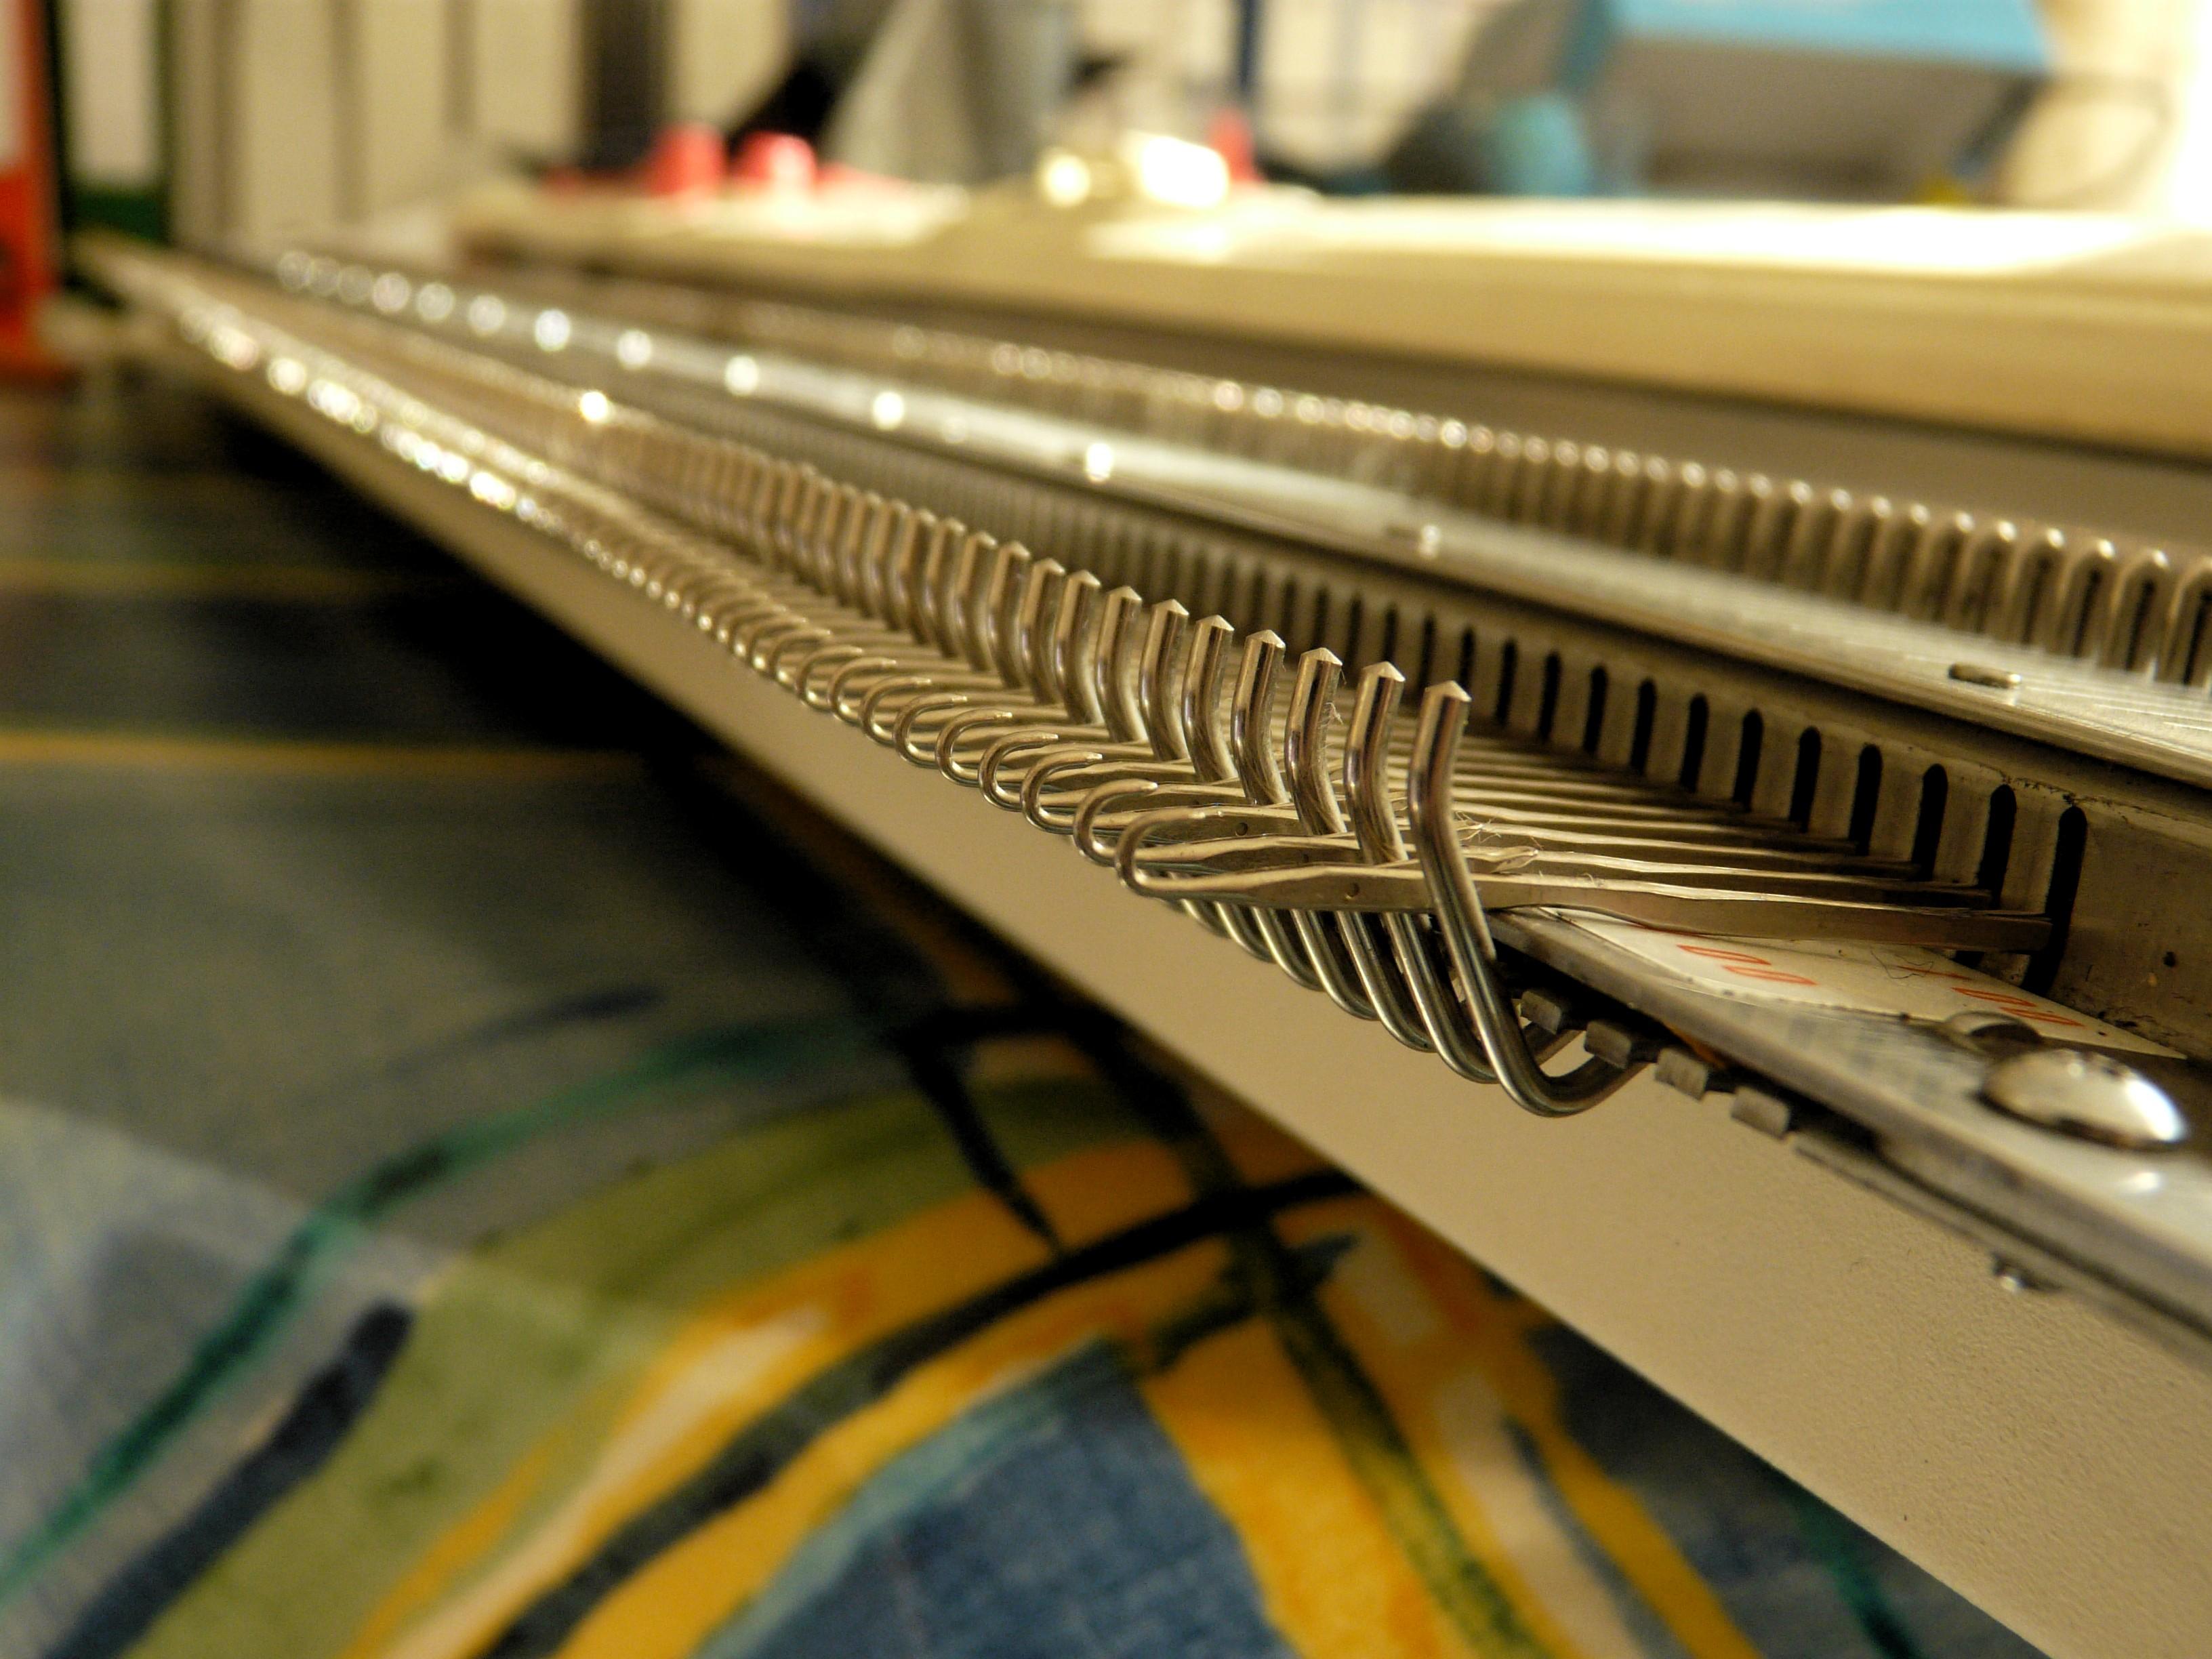 Needle bed